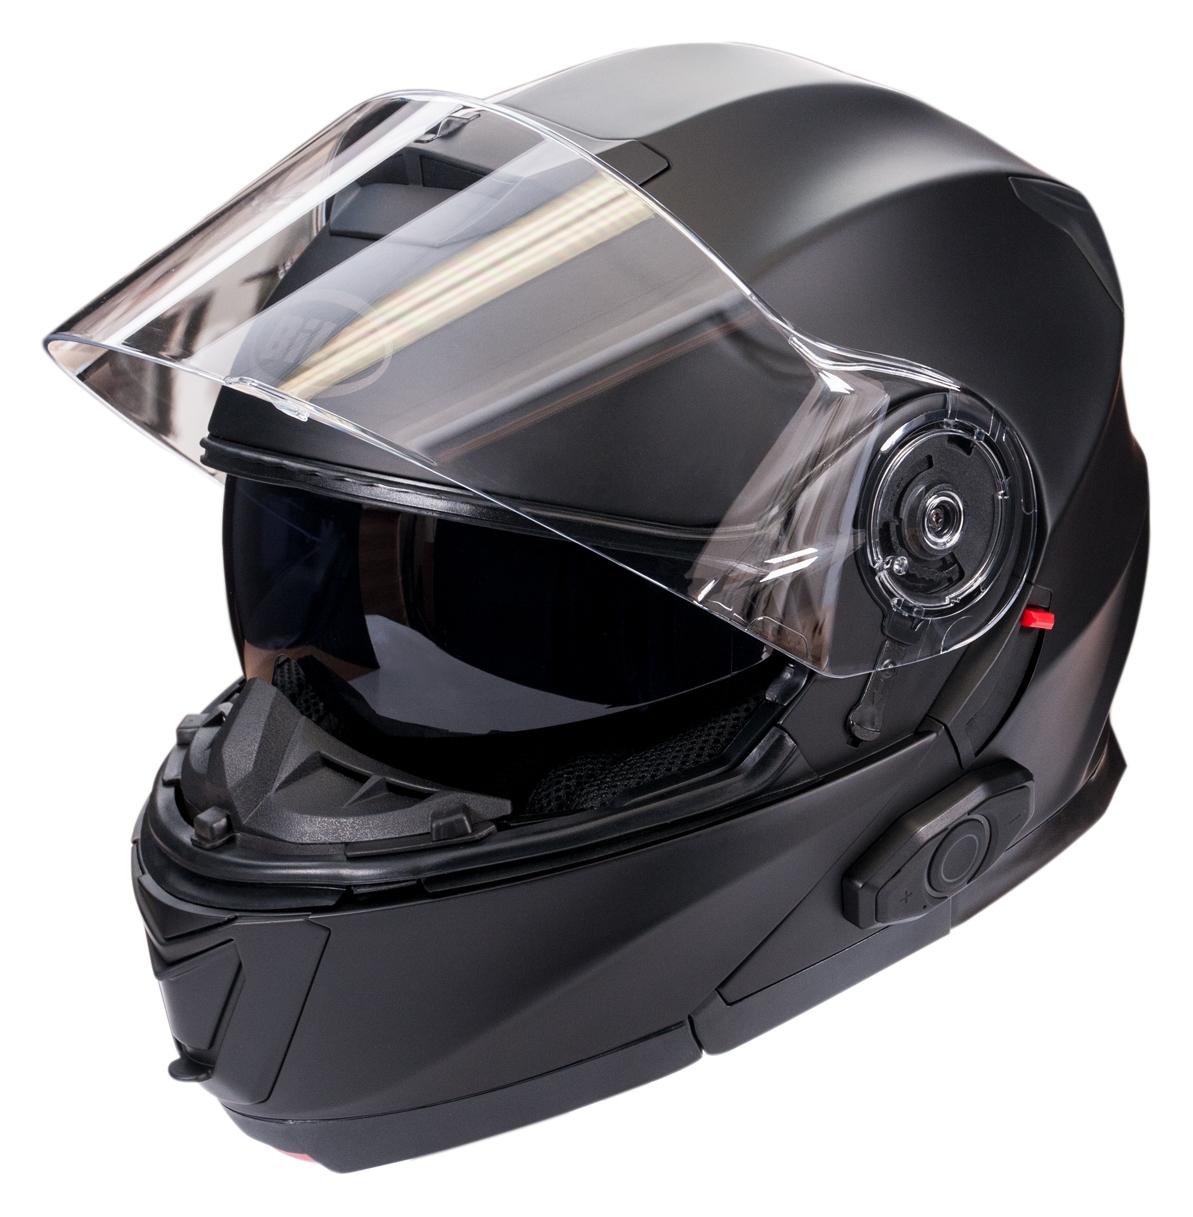 18cdb1c8 Bilt Techno 2.0 Sena Bluetooth Evolution Modular Helmet - Cycle Gear